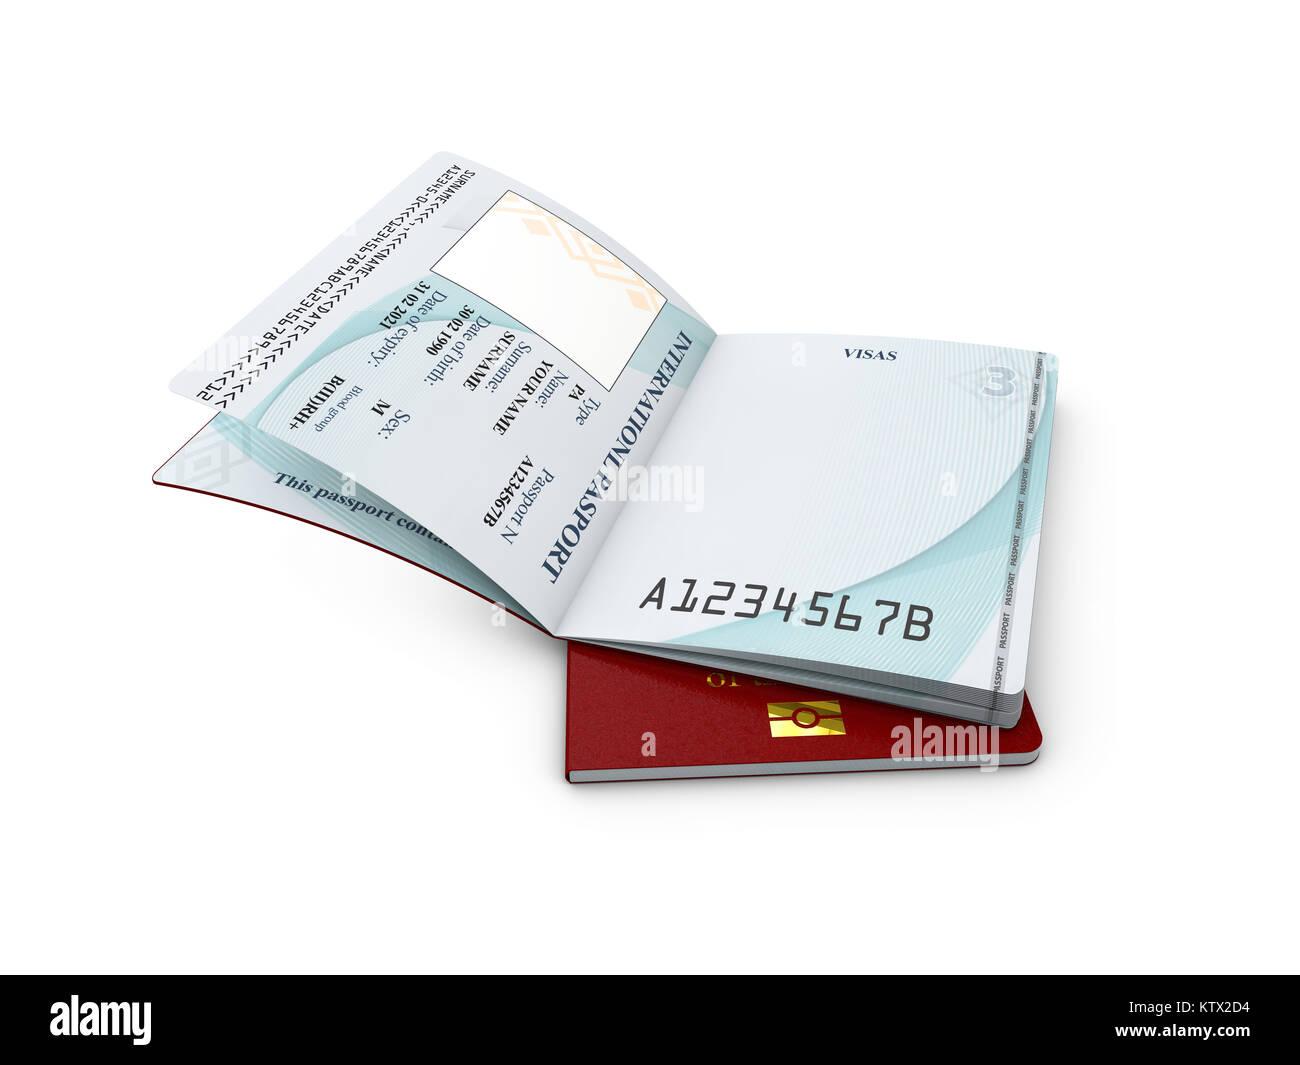 Passport Page Blank Stockfotos & Passport Page Blank Bilder - Alamy